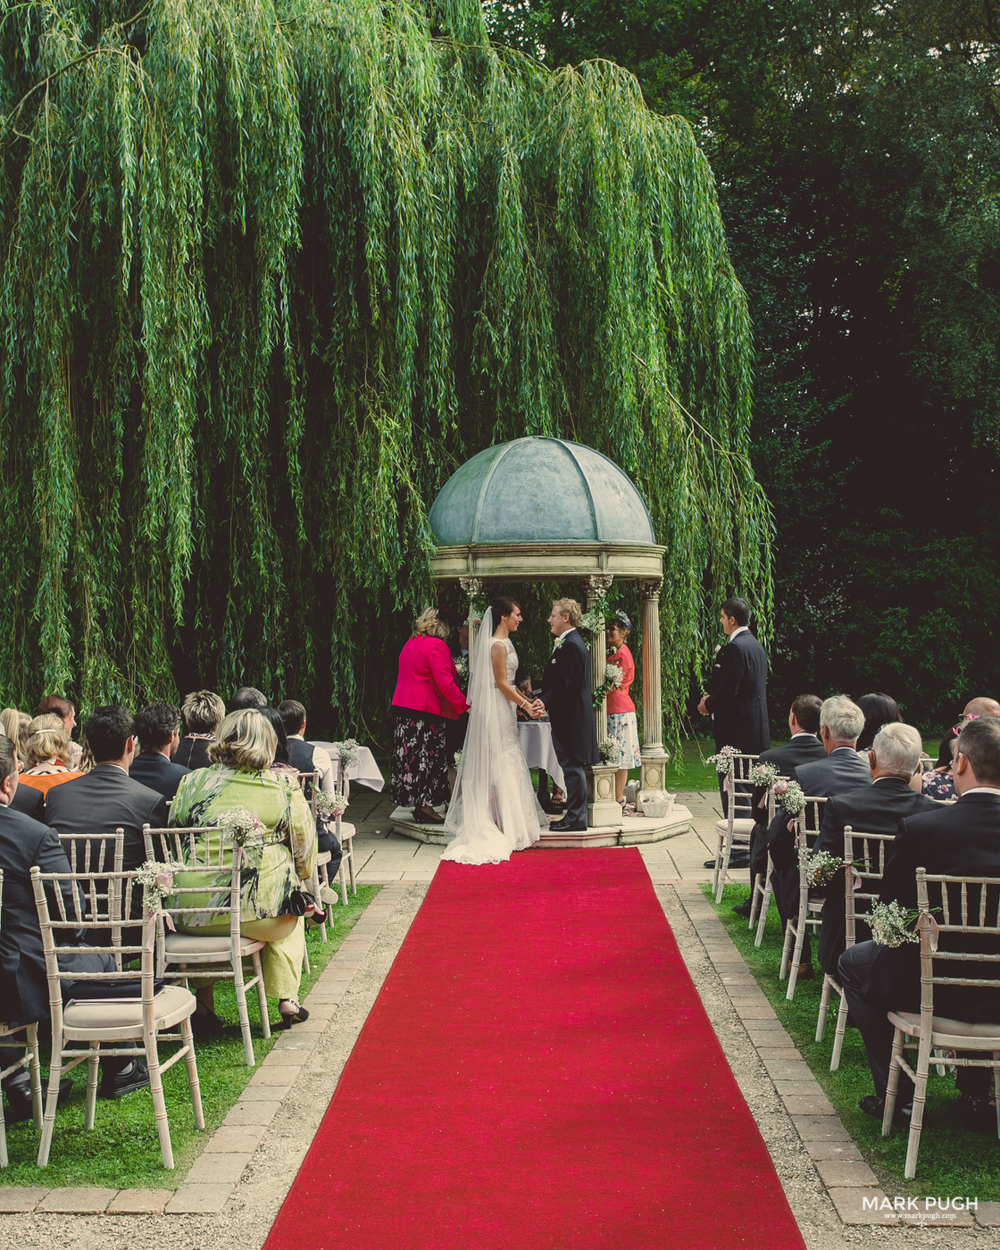 072 - Wedding Photography at The Dower House Hotel Manor Estate Woodhall Spa Lincolnshire LN10 6PY by Mark Pugh www.mpmedia.co.uk www.markpugh.com.jpg